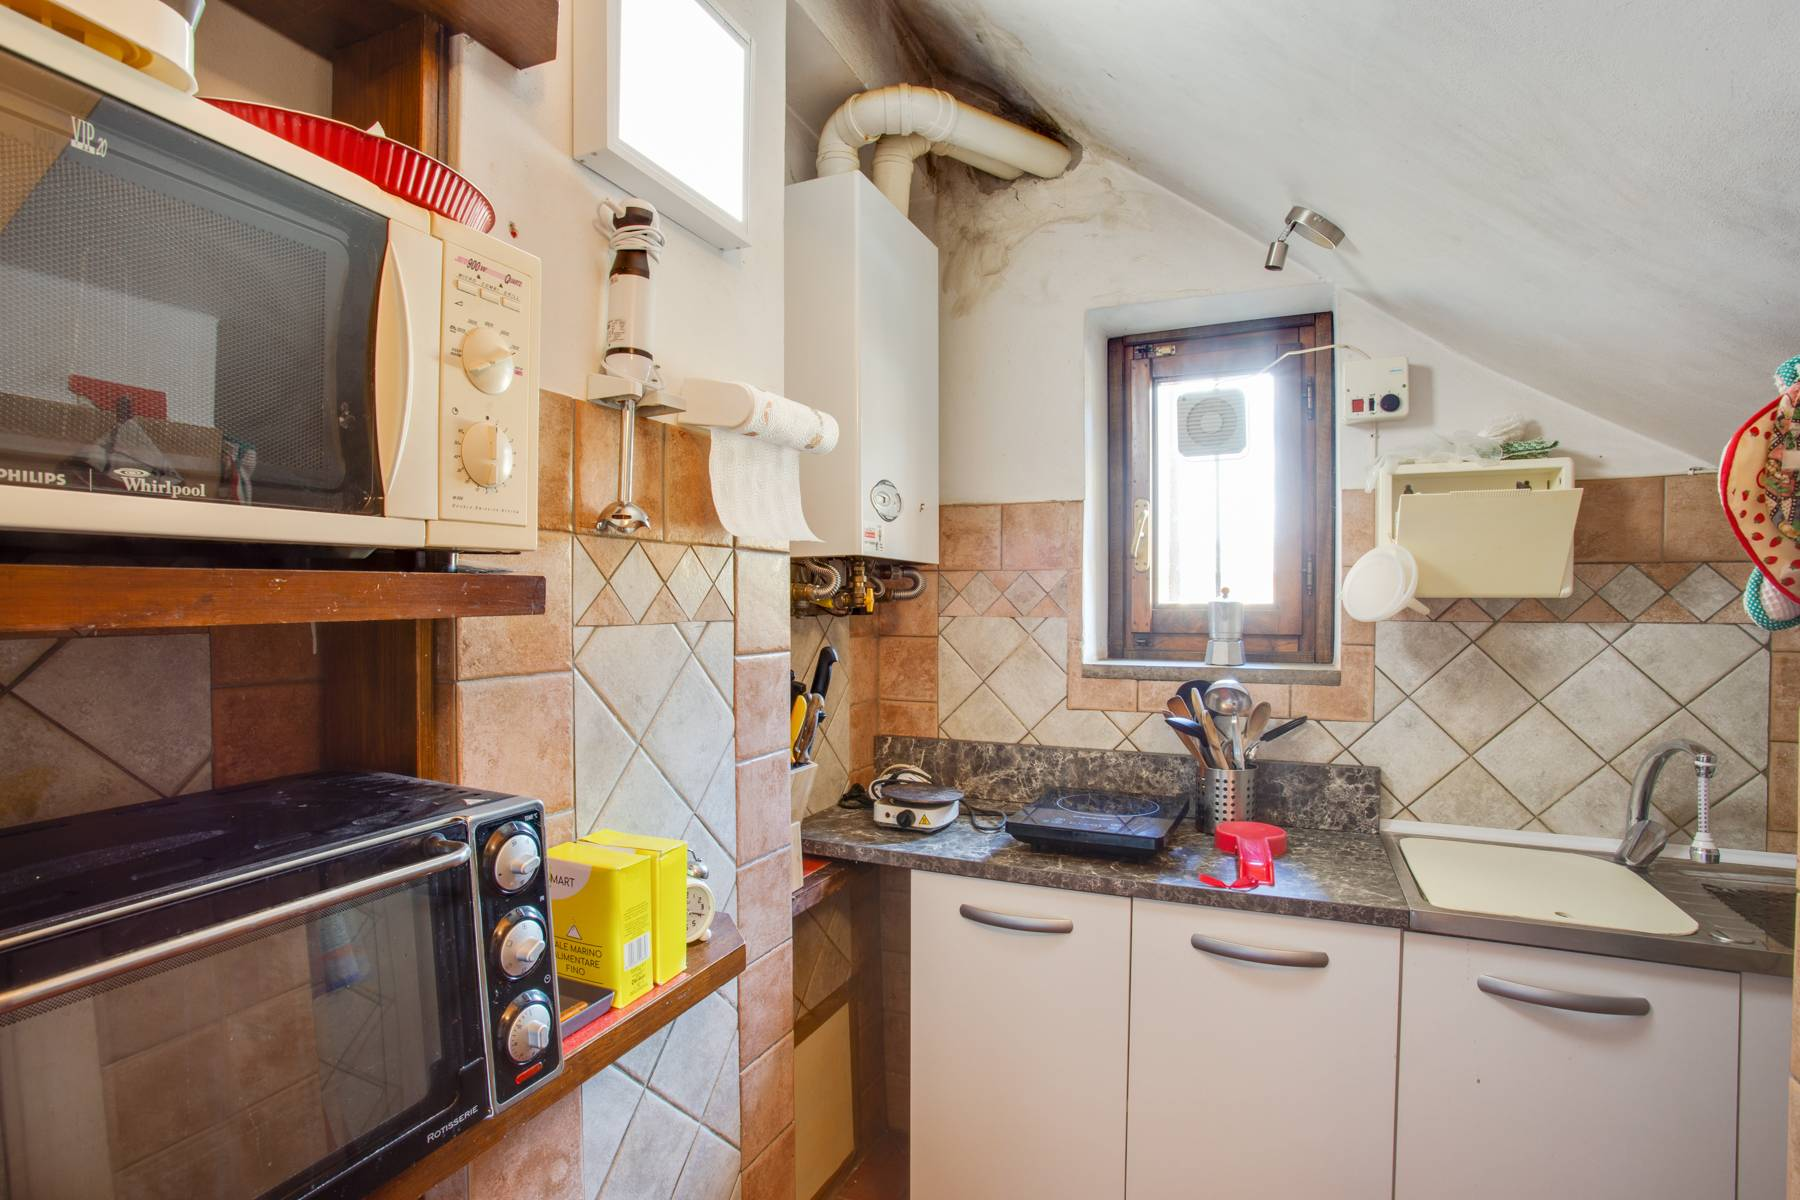 Appartamento in Vendita a Scandicci: 5 locali, 170 mq - Foto 9